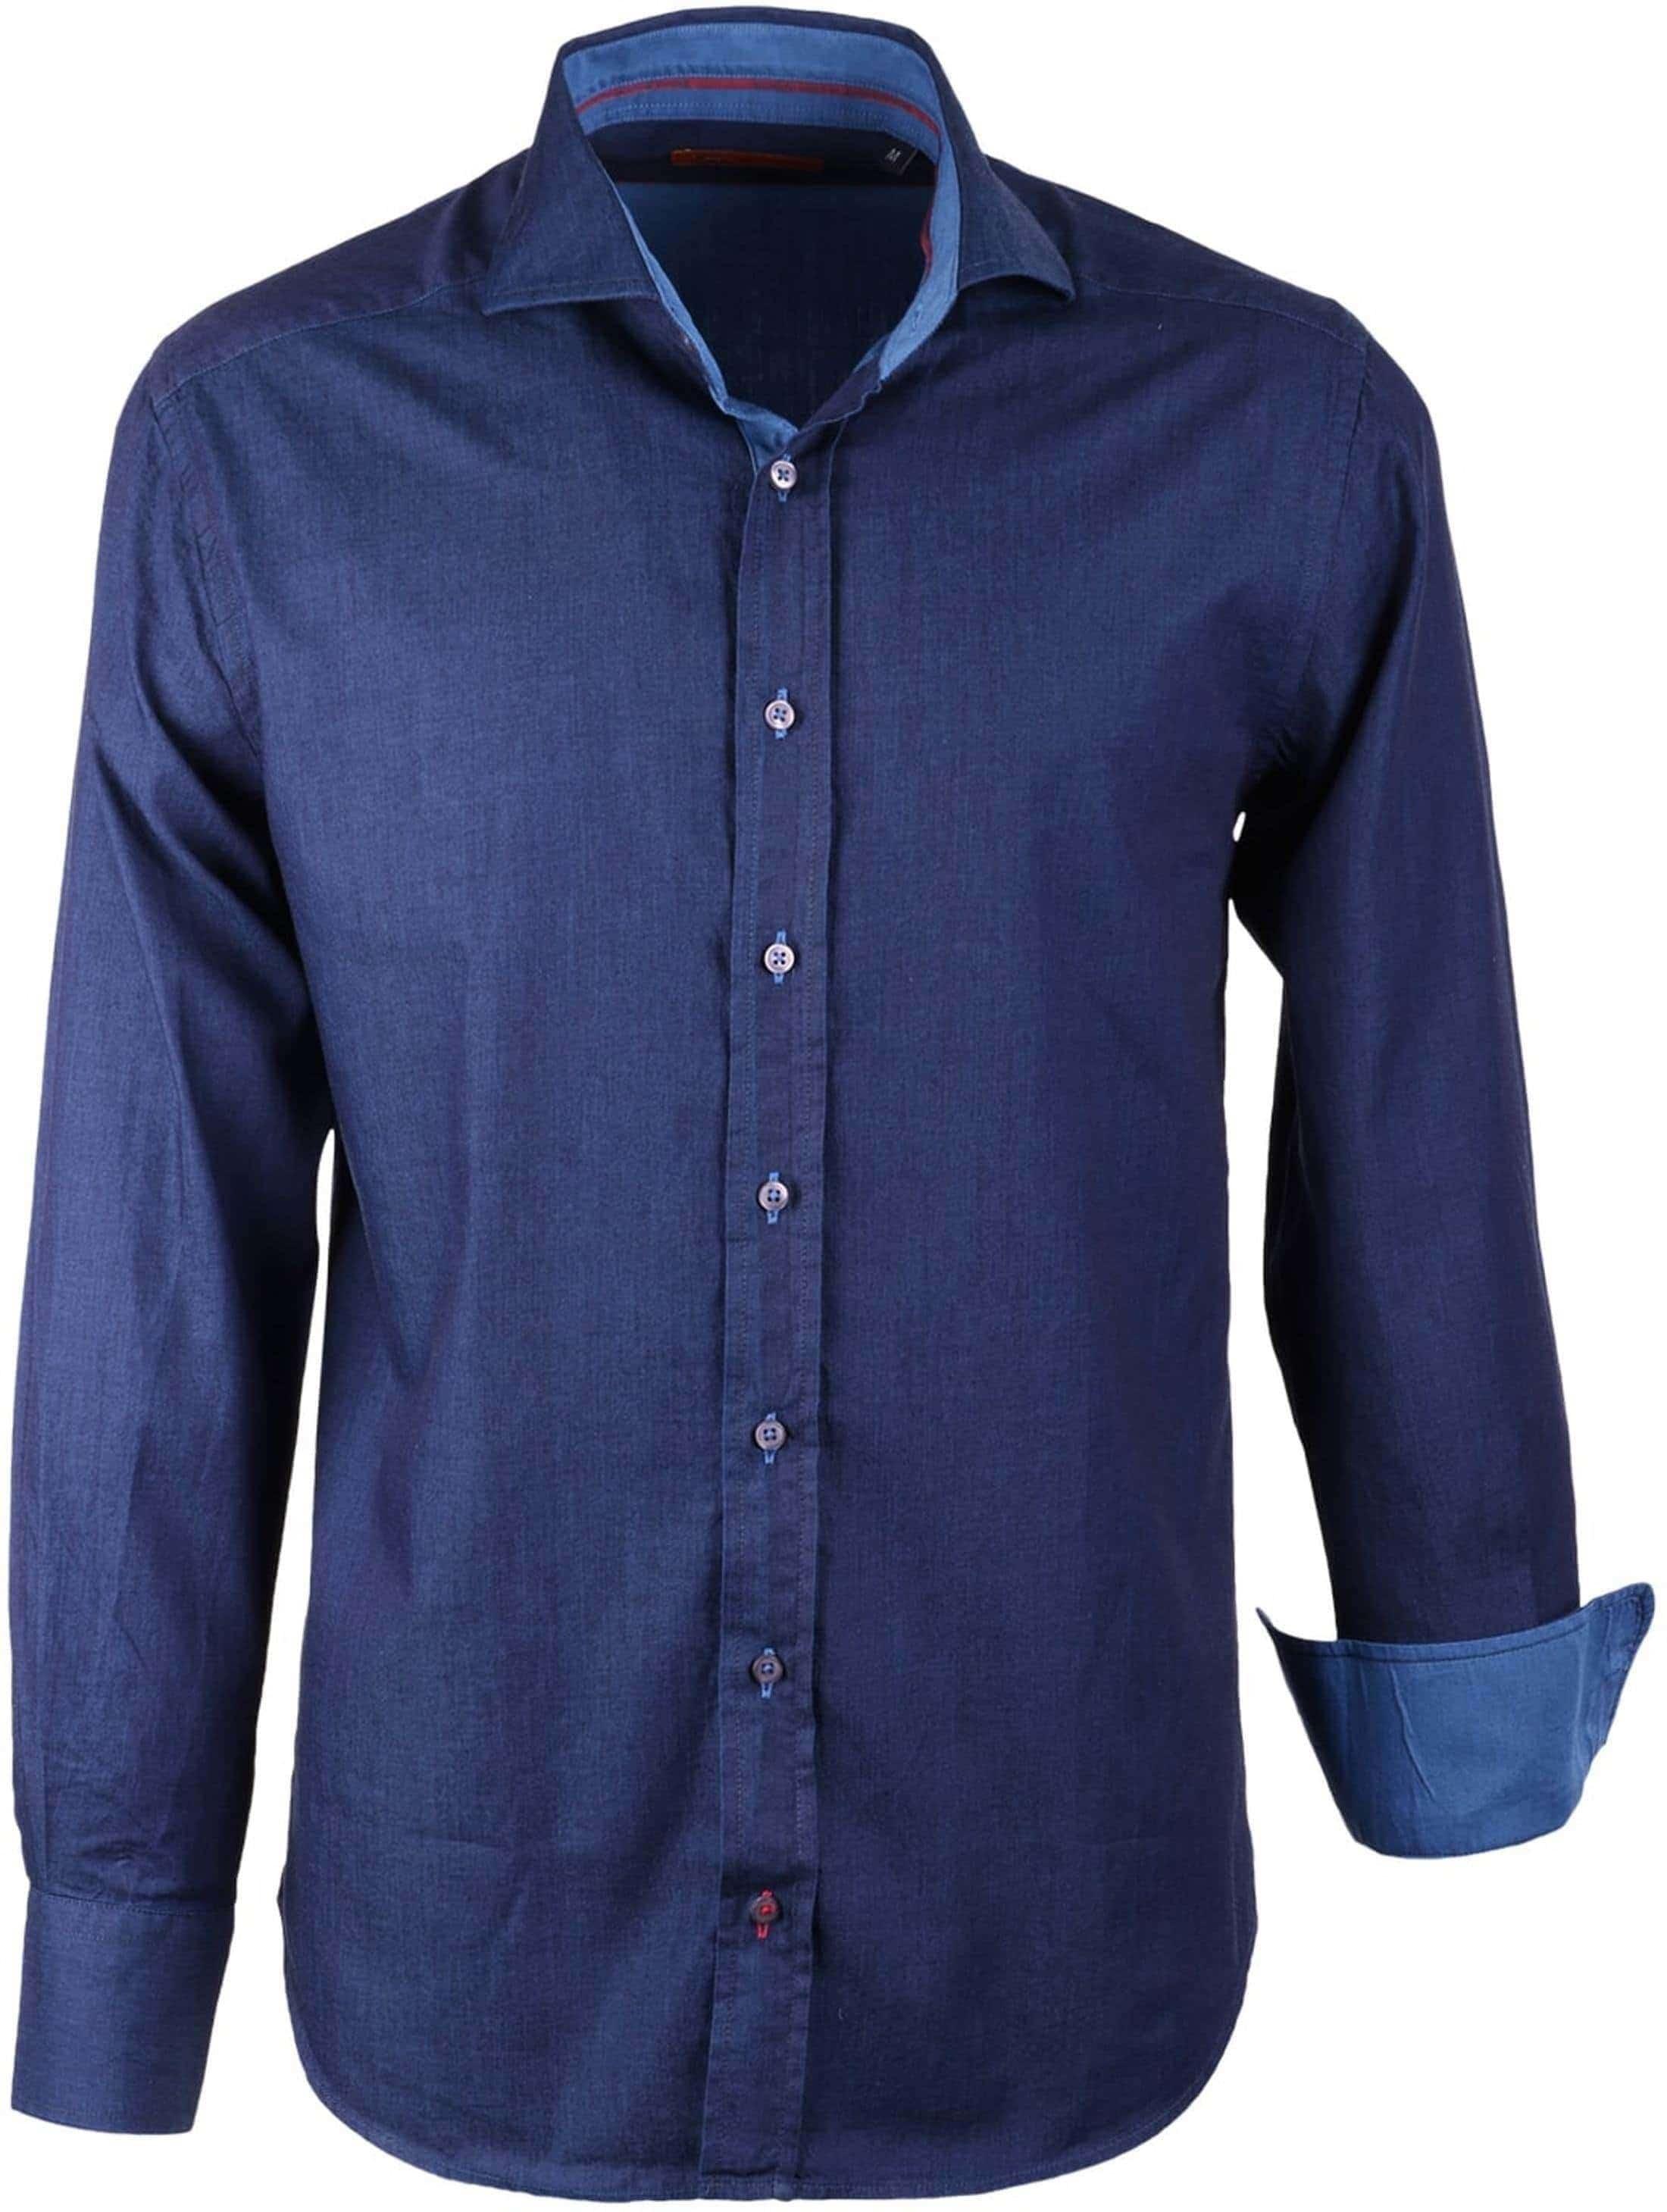 c972da51645984 tapijt bruin vintage Overhemd Blauw Slim Fit foto 0